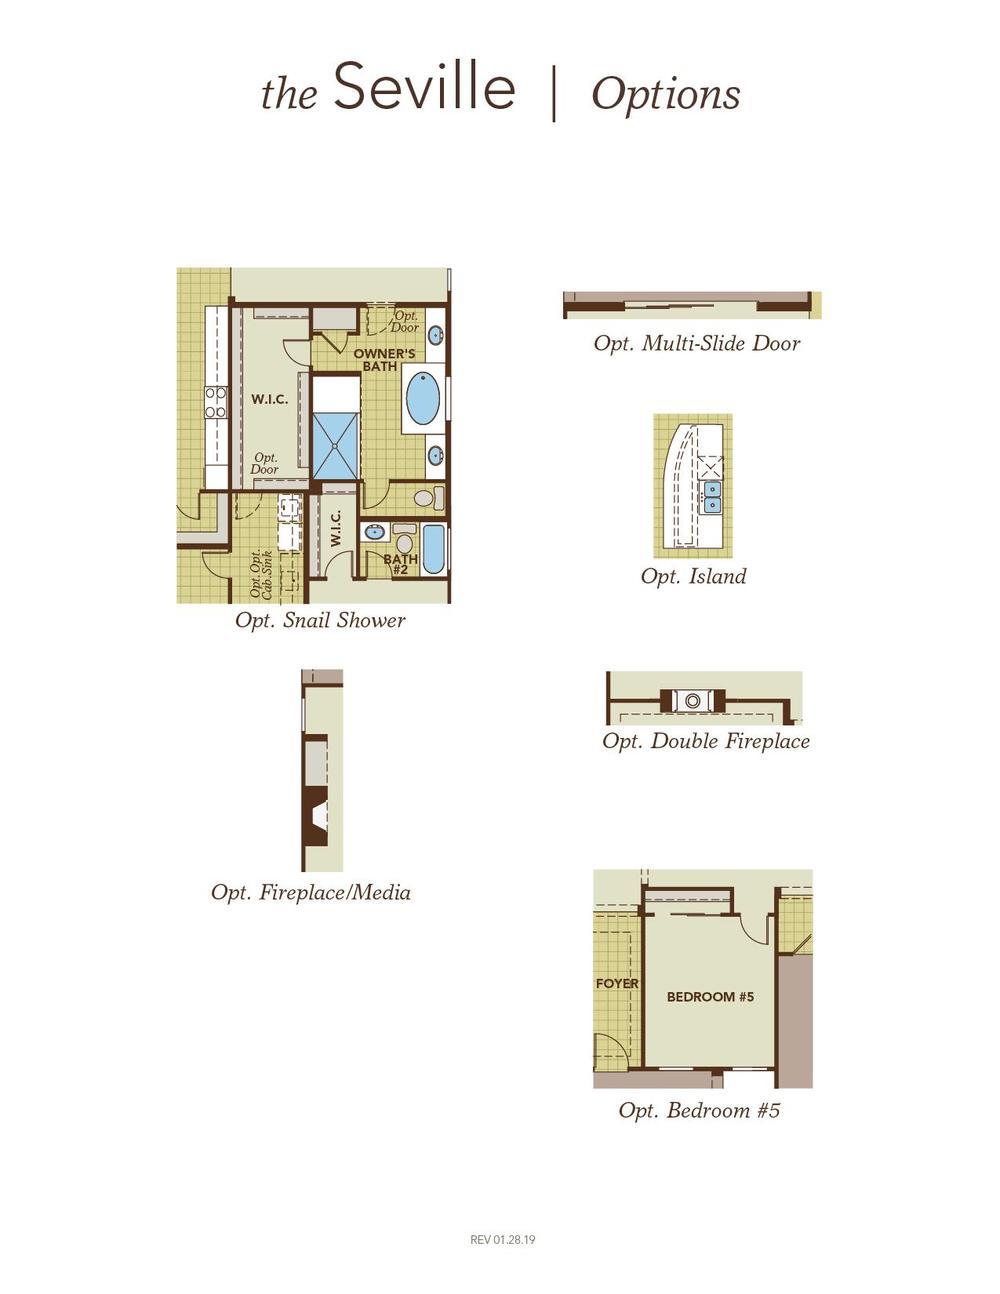 Seville - Floor Plan Options